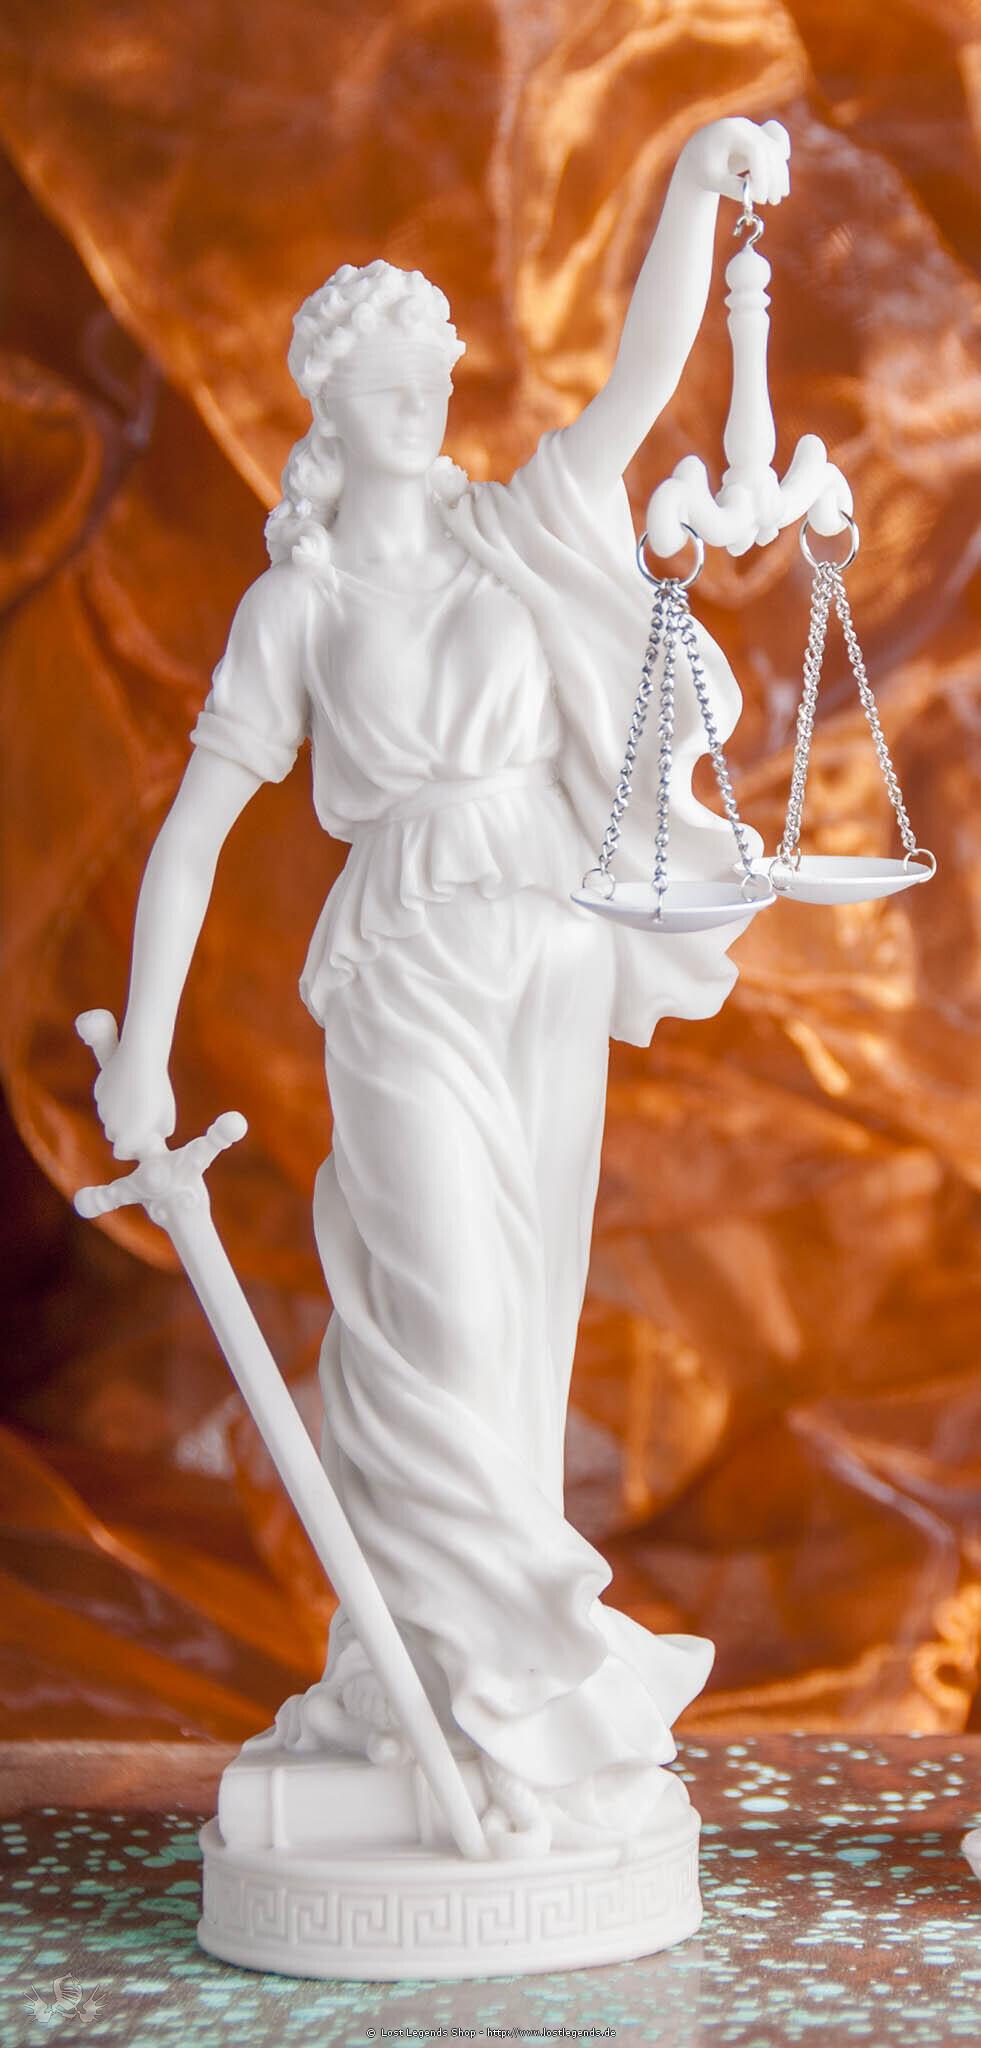 Justitia Kunstharz, 28 cm